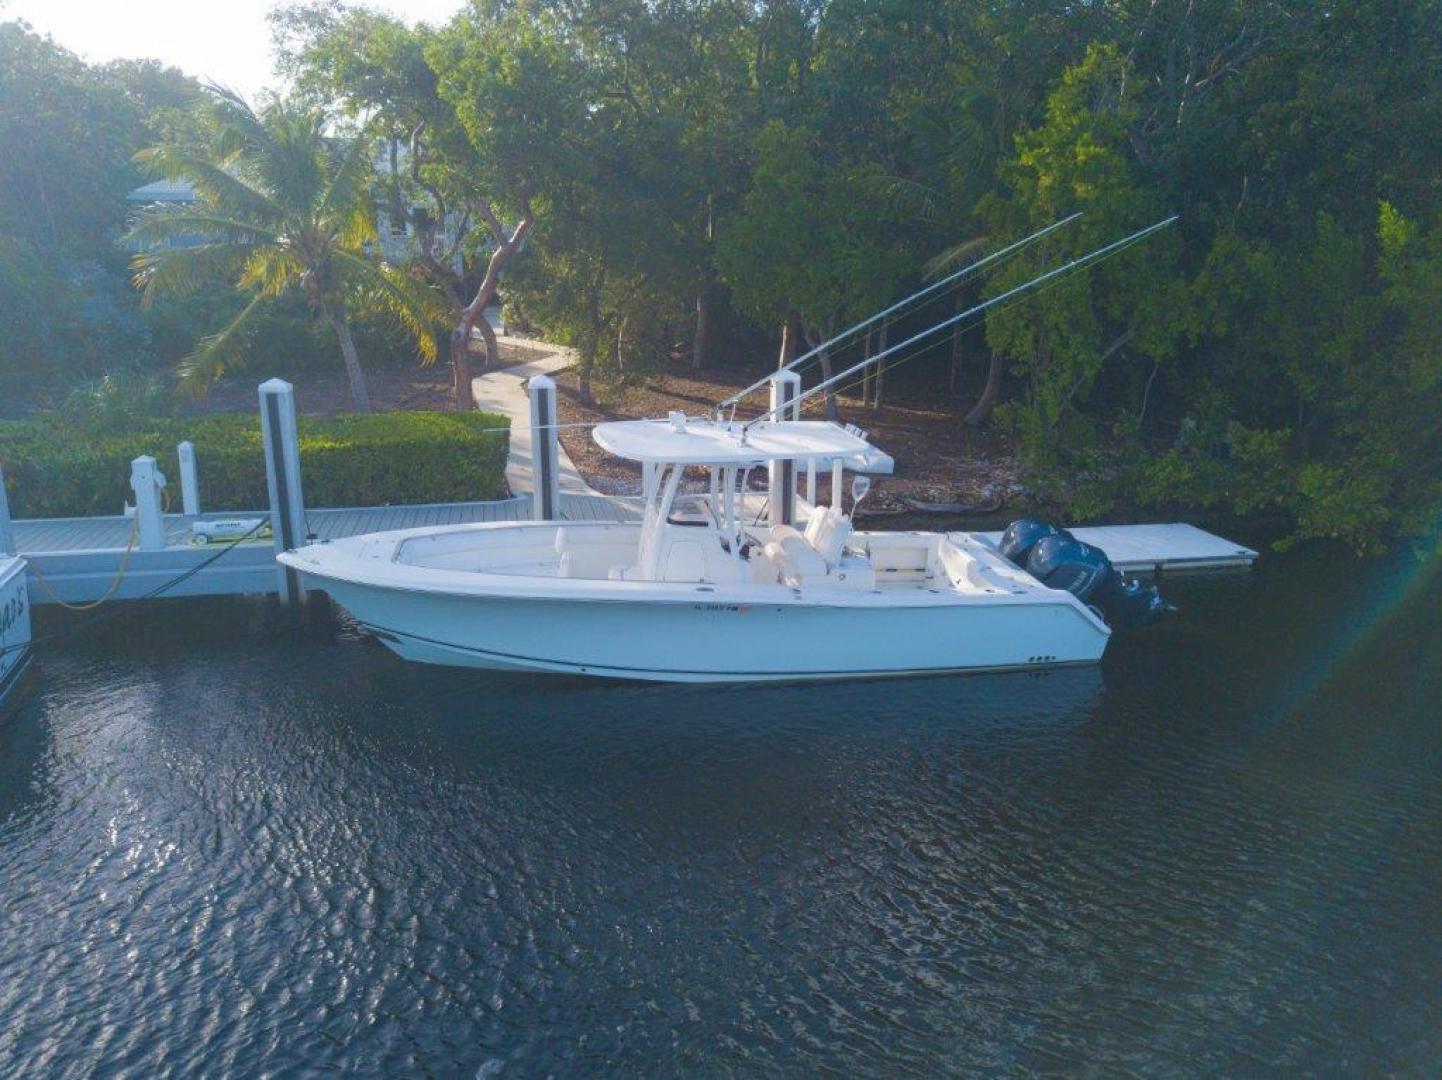 Sea Hunt-Gamefisherman 2013-No Name 29 Sea Hunt Key Largo-Florida-United States-No Name 29 Sea Hunt-1562279 | Thumbnail